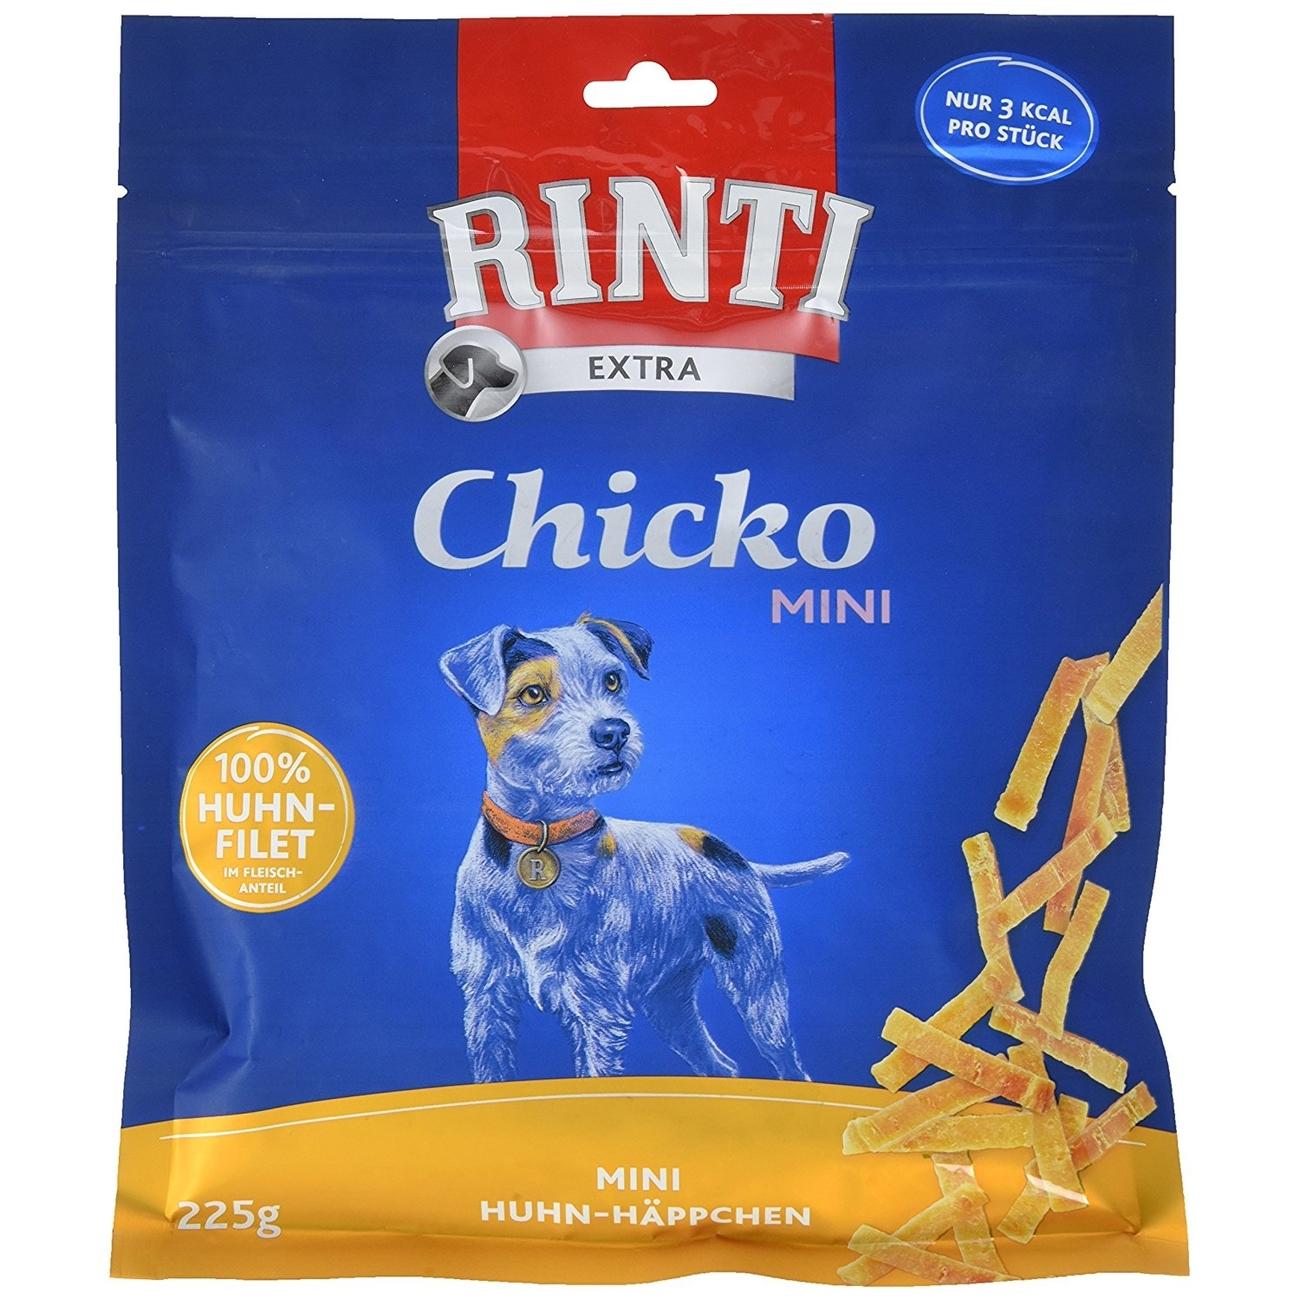 Rinti Chicko Mini Hundesnacks für kleine Hunde Bild 5